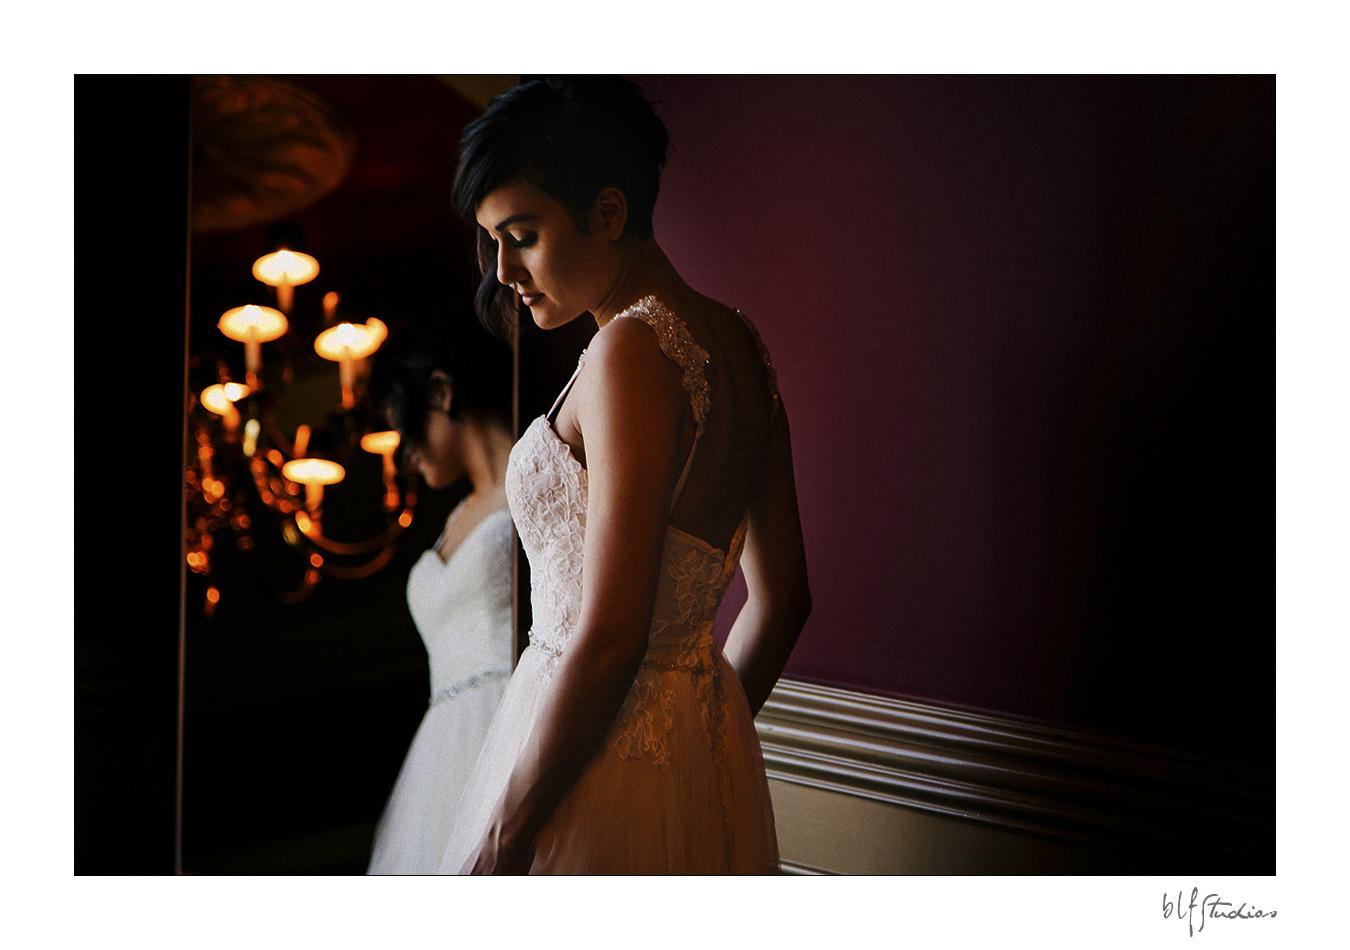 0009-blfstudios-wedding-photographer-daniel-danielle-atlanta.jpg